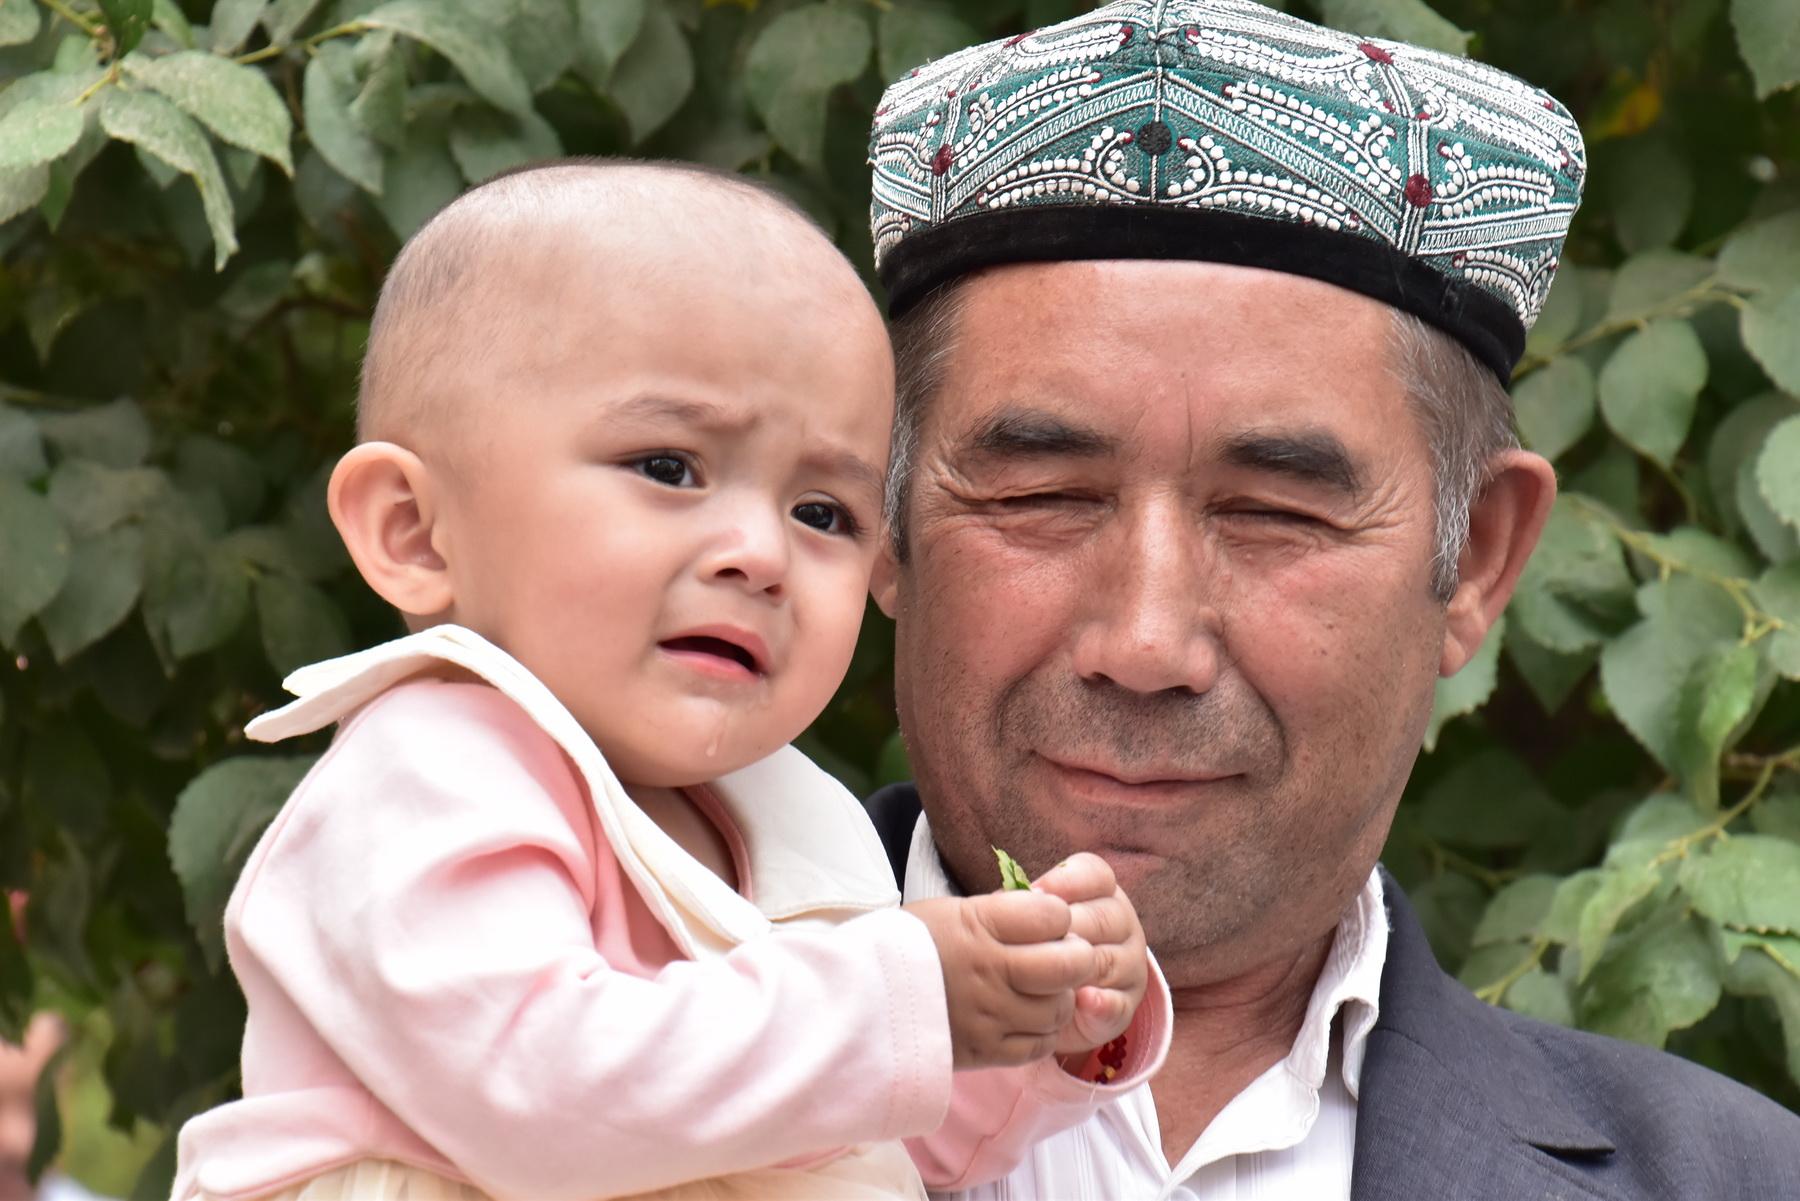 סין - אב וביתו